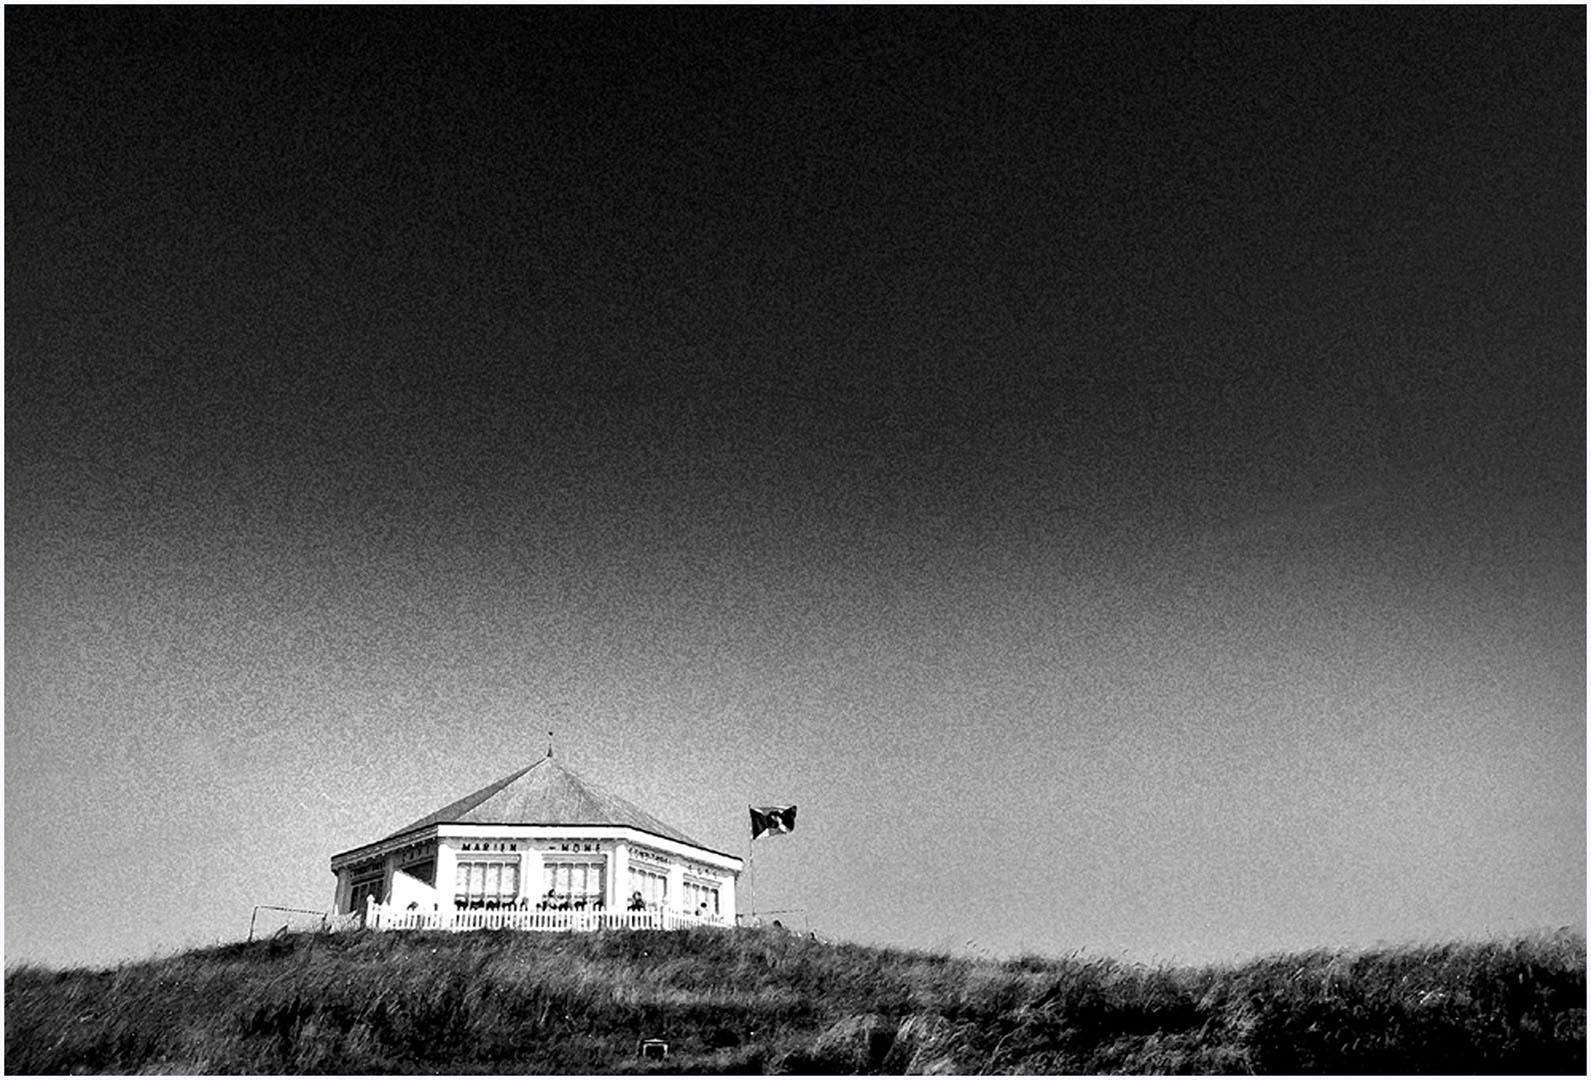 North_Sea_Urban_056_U4.63